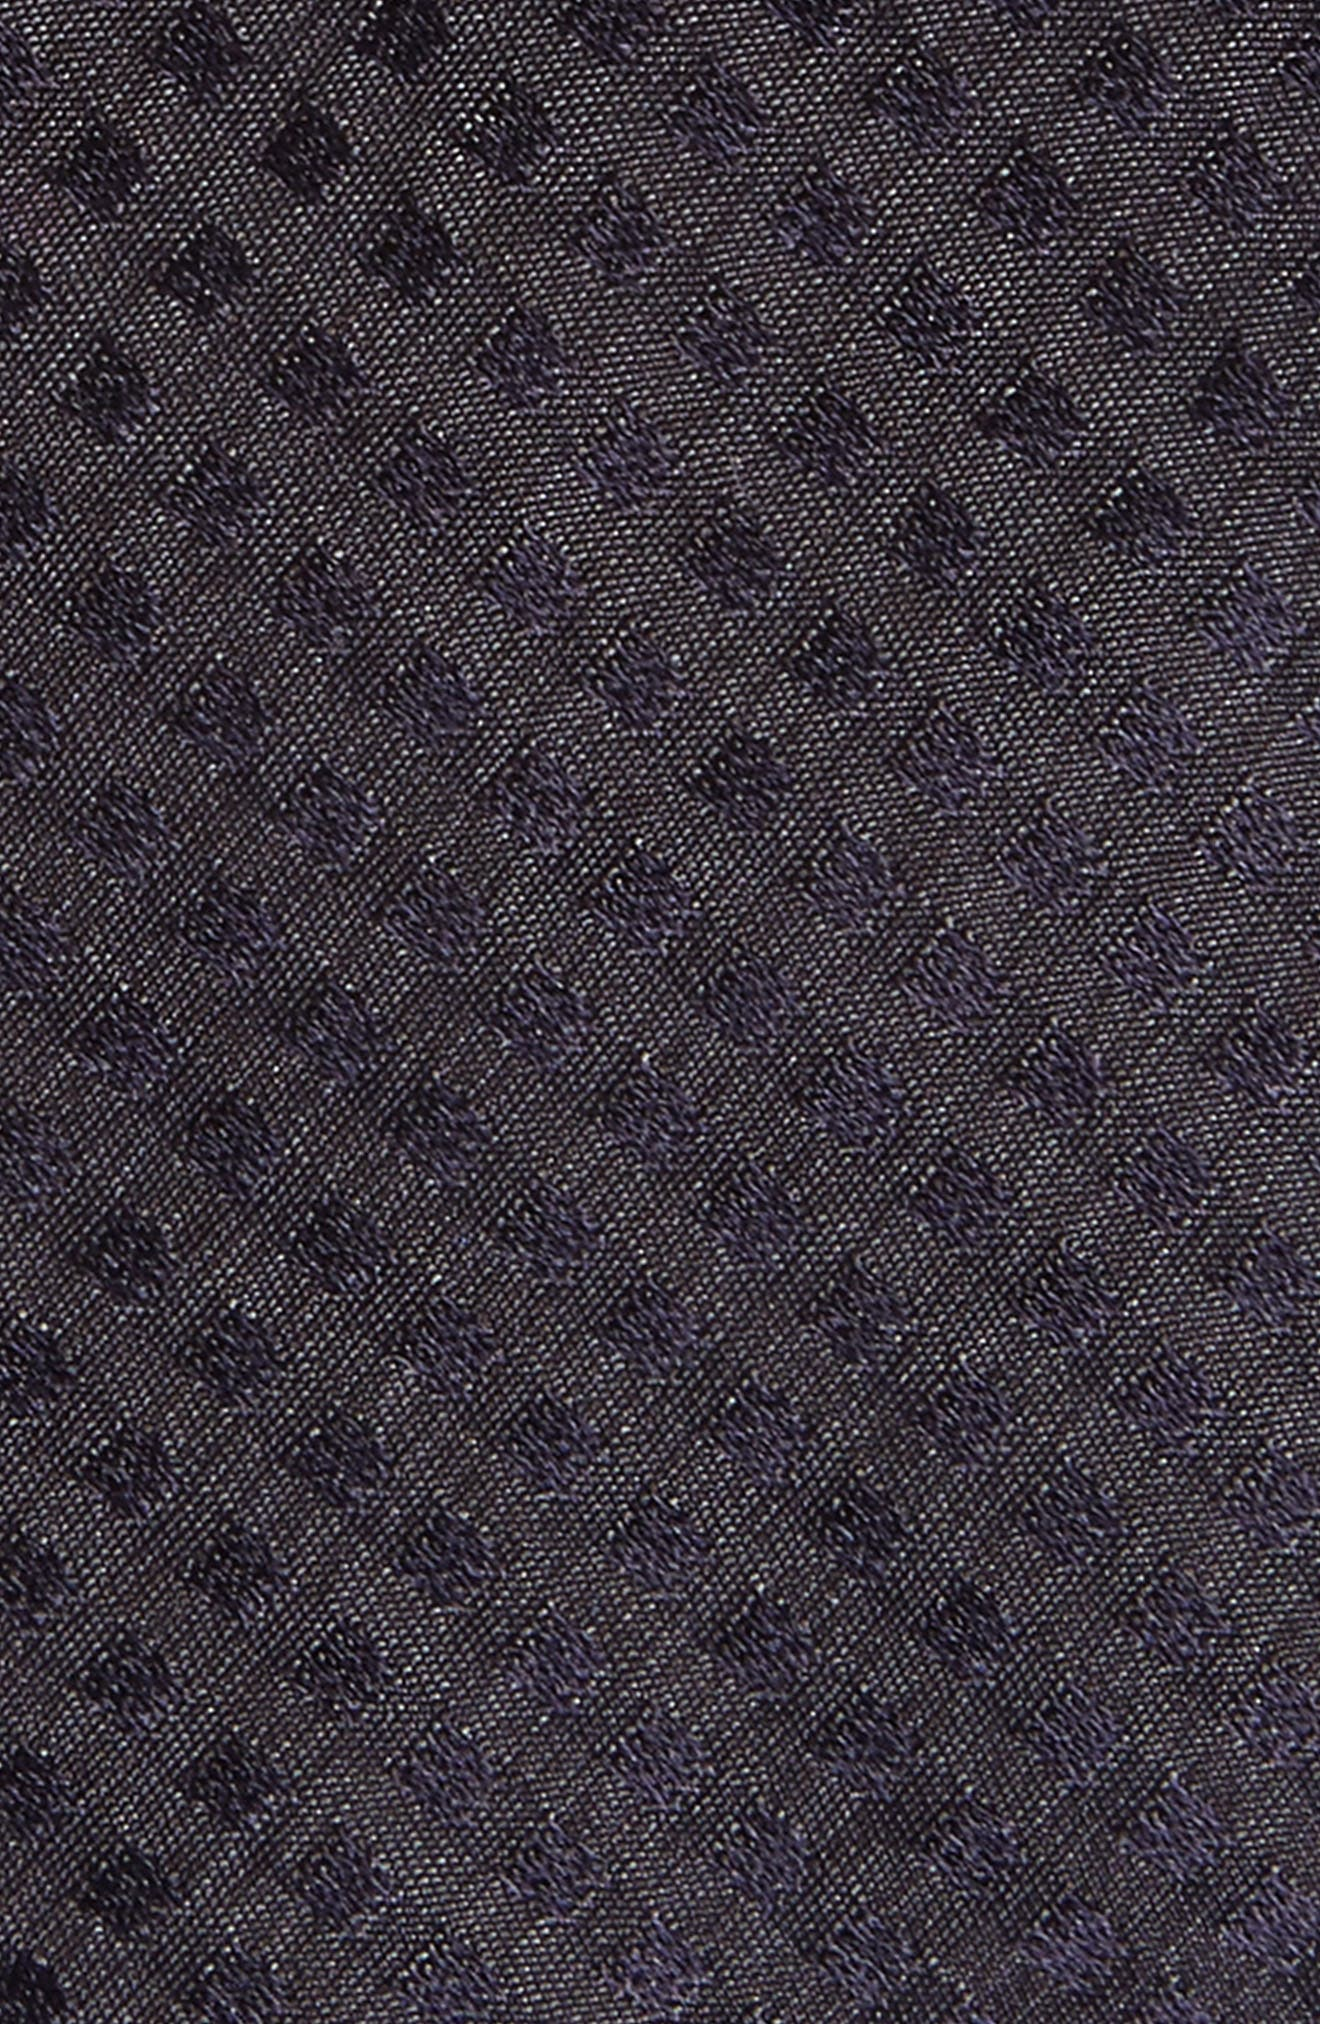 Dot Skinny Silk Tie,                             Alternate thumbnail 2, color,                             Navy